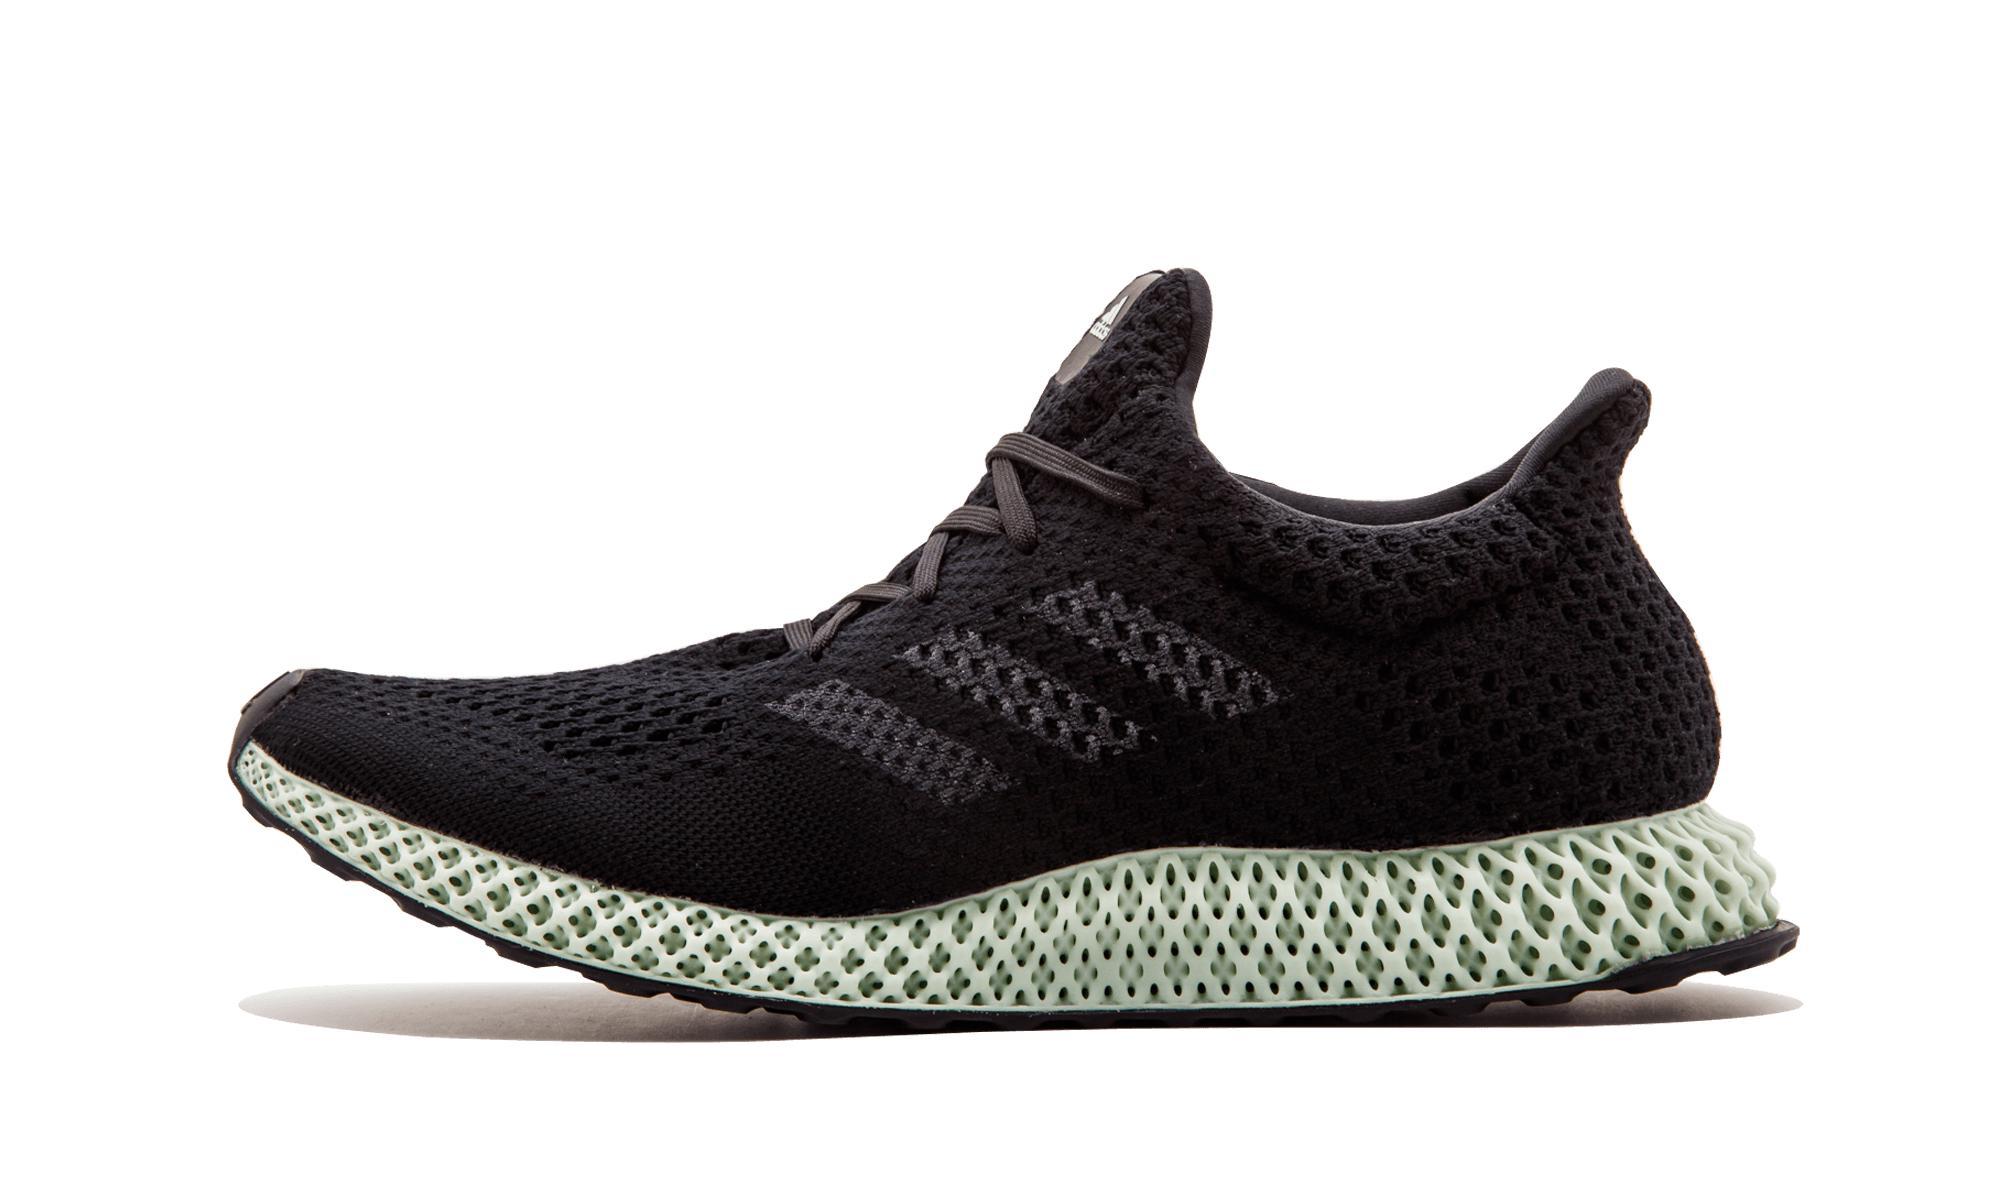 brand new a8c5d 4ae87 adidas. Mens Black Futurecraft 4d